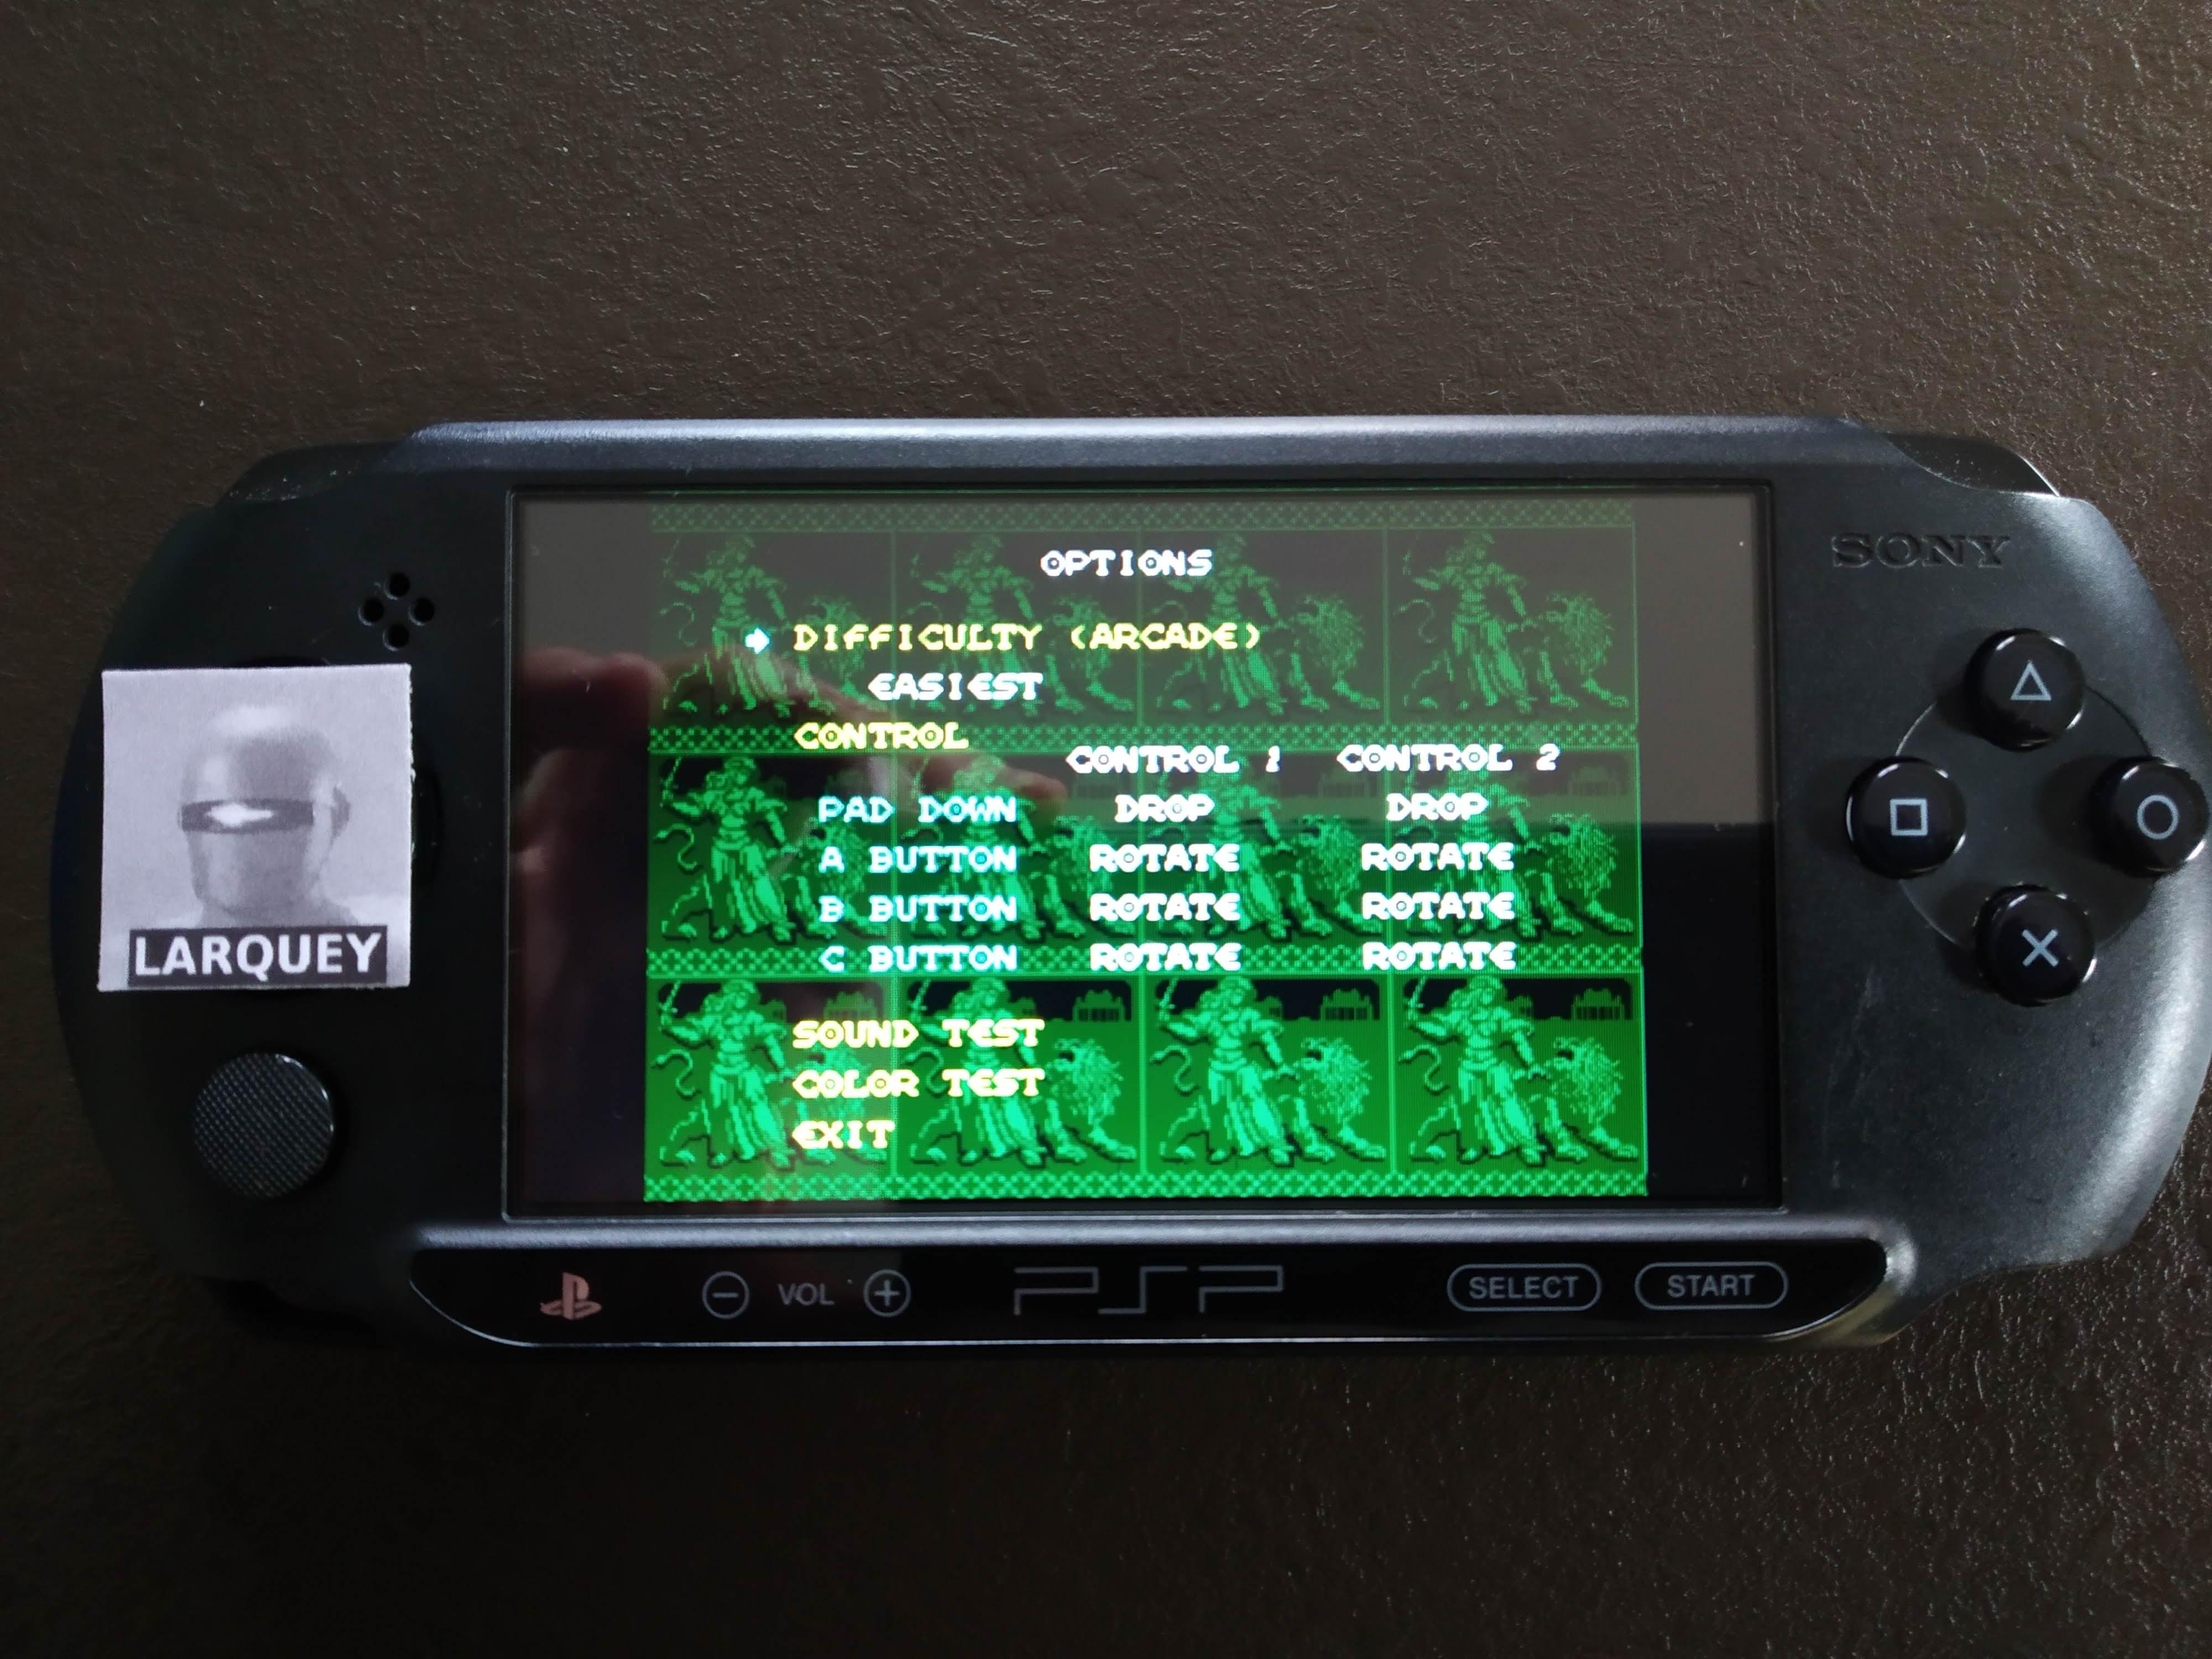 Larquey: Sega Genesis/Mega Drive Collection: Columns Arcade [Easiest] (PSP) 12,581 points on 2019-12-27 02:53:24